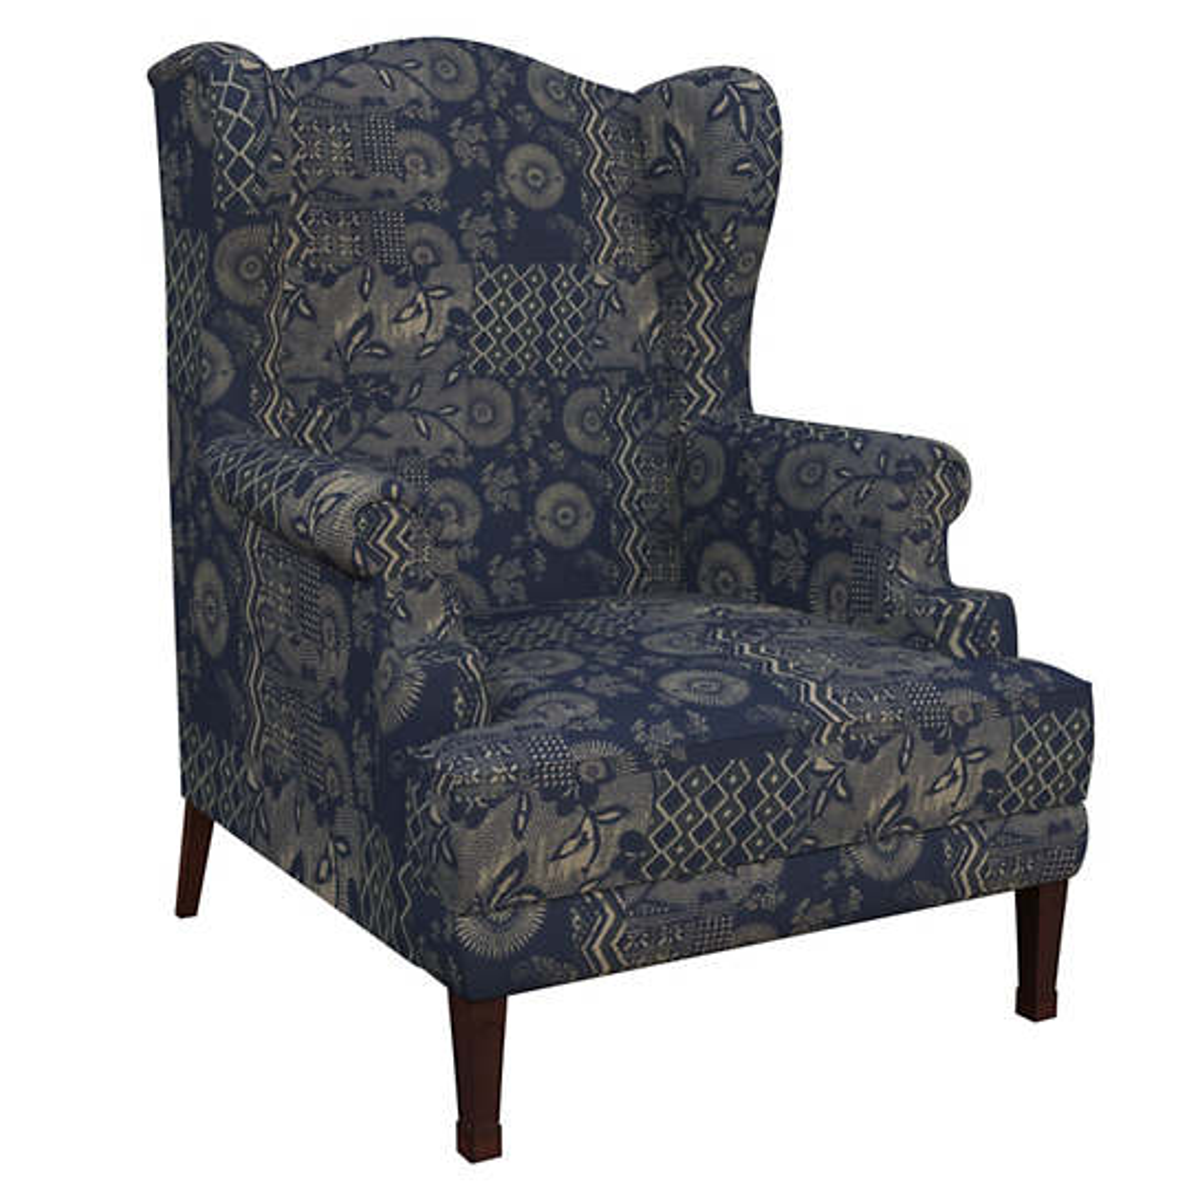 Marianna Linen Lismore Chair